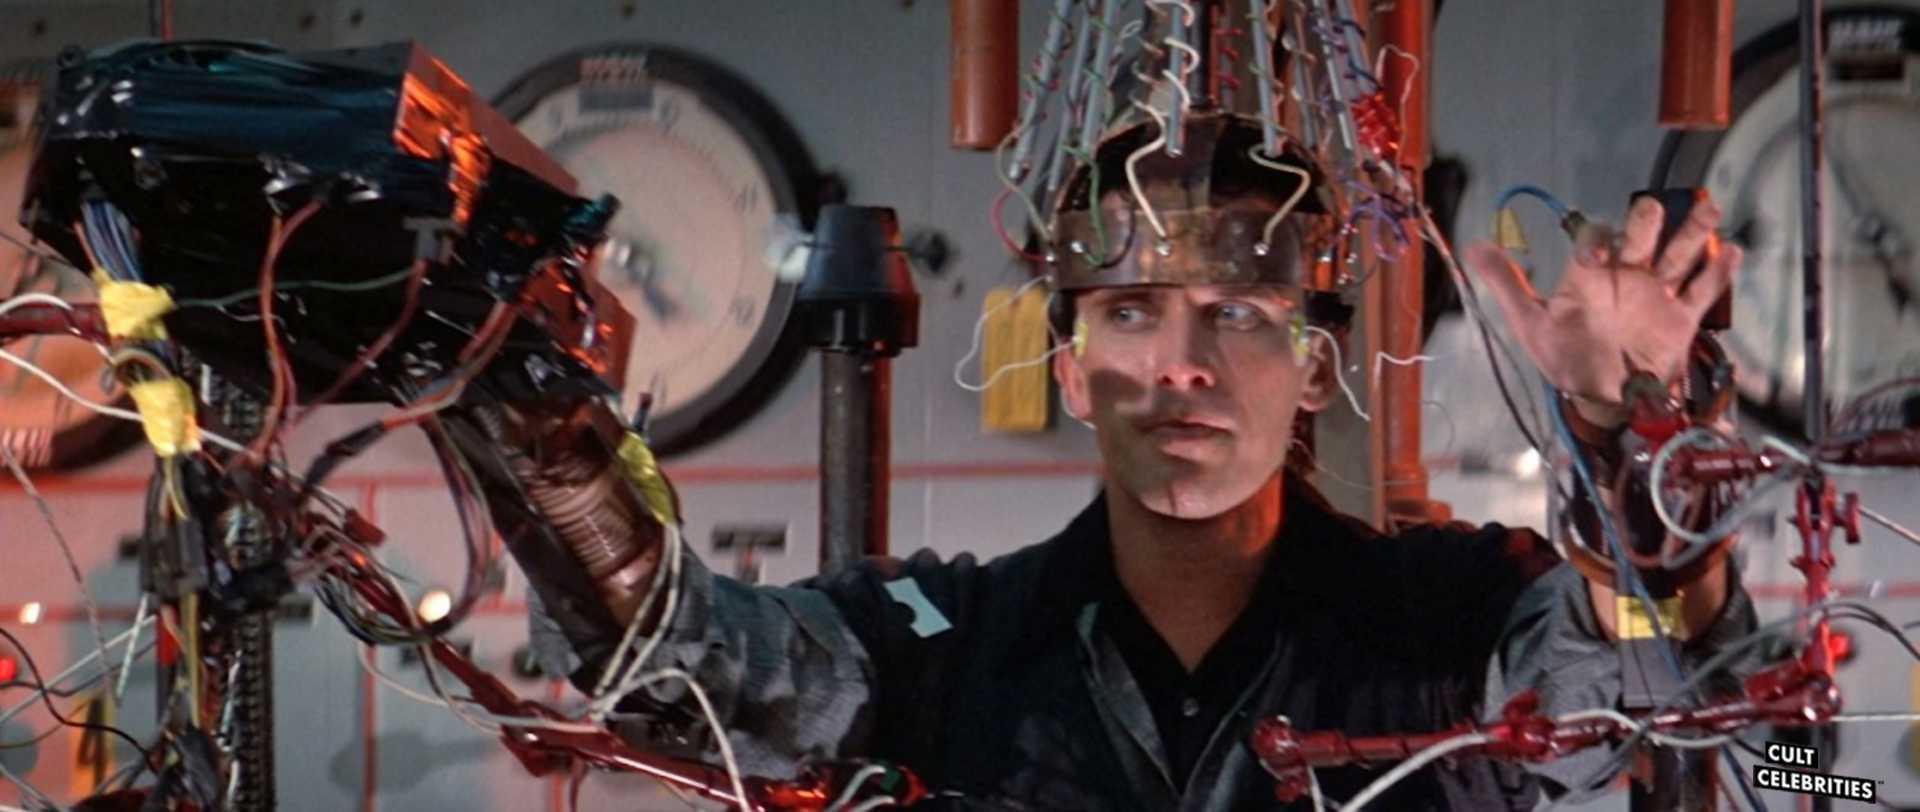 Peter Weller in The Adventures of Buckaroo Banzai Across the 8th Dimension (1984)